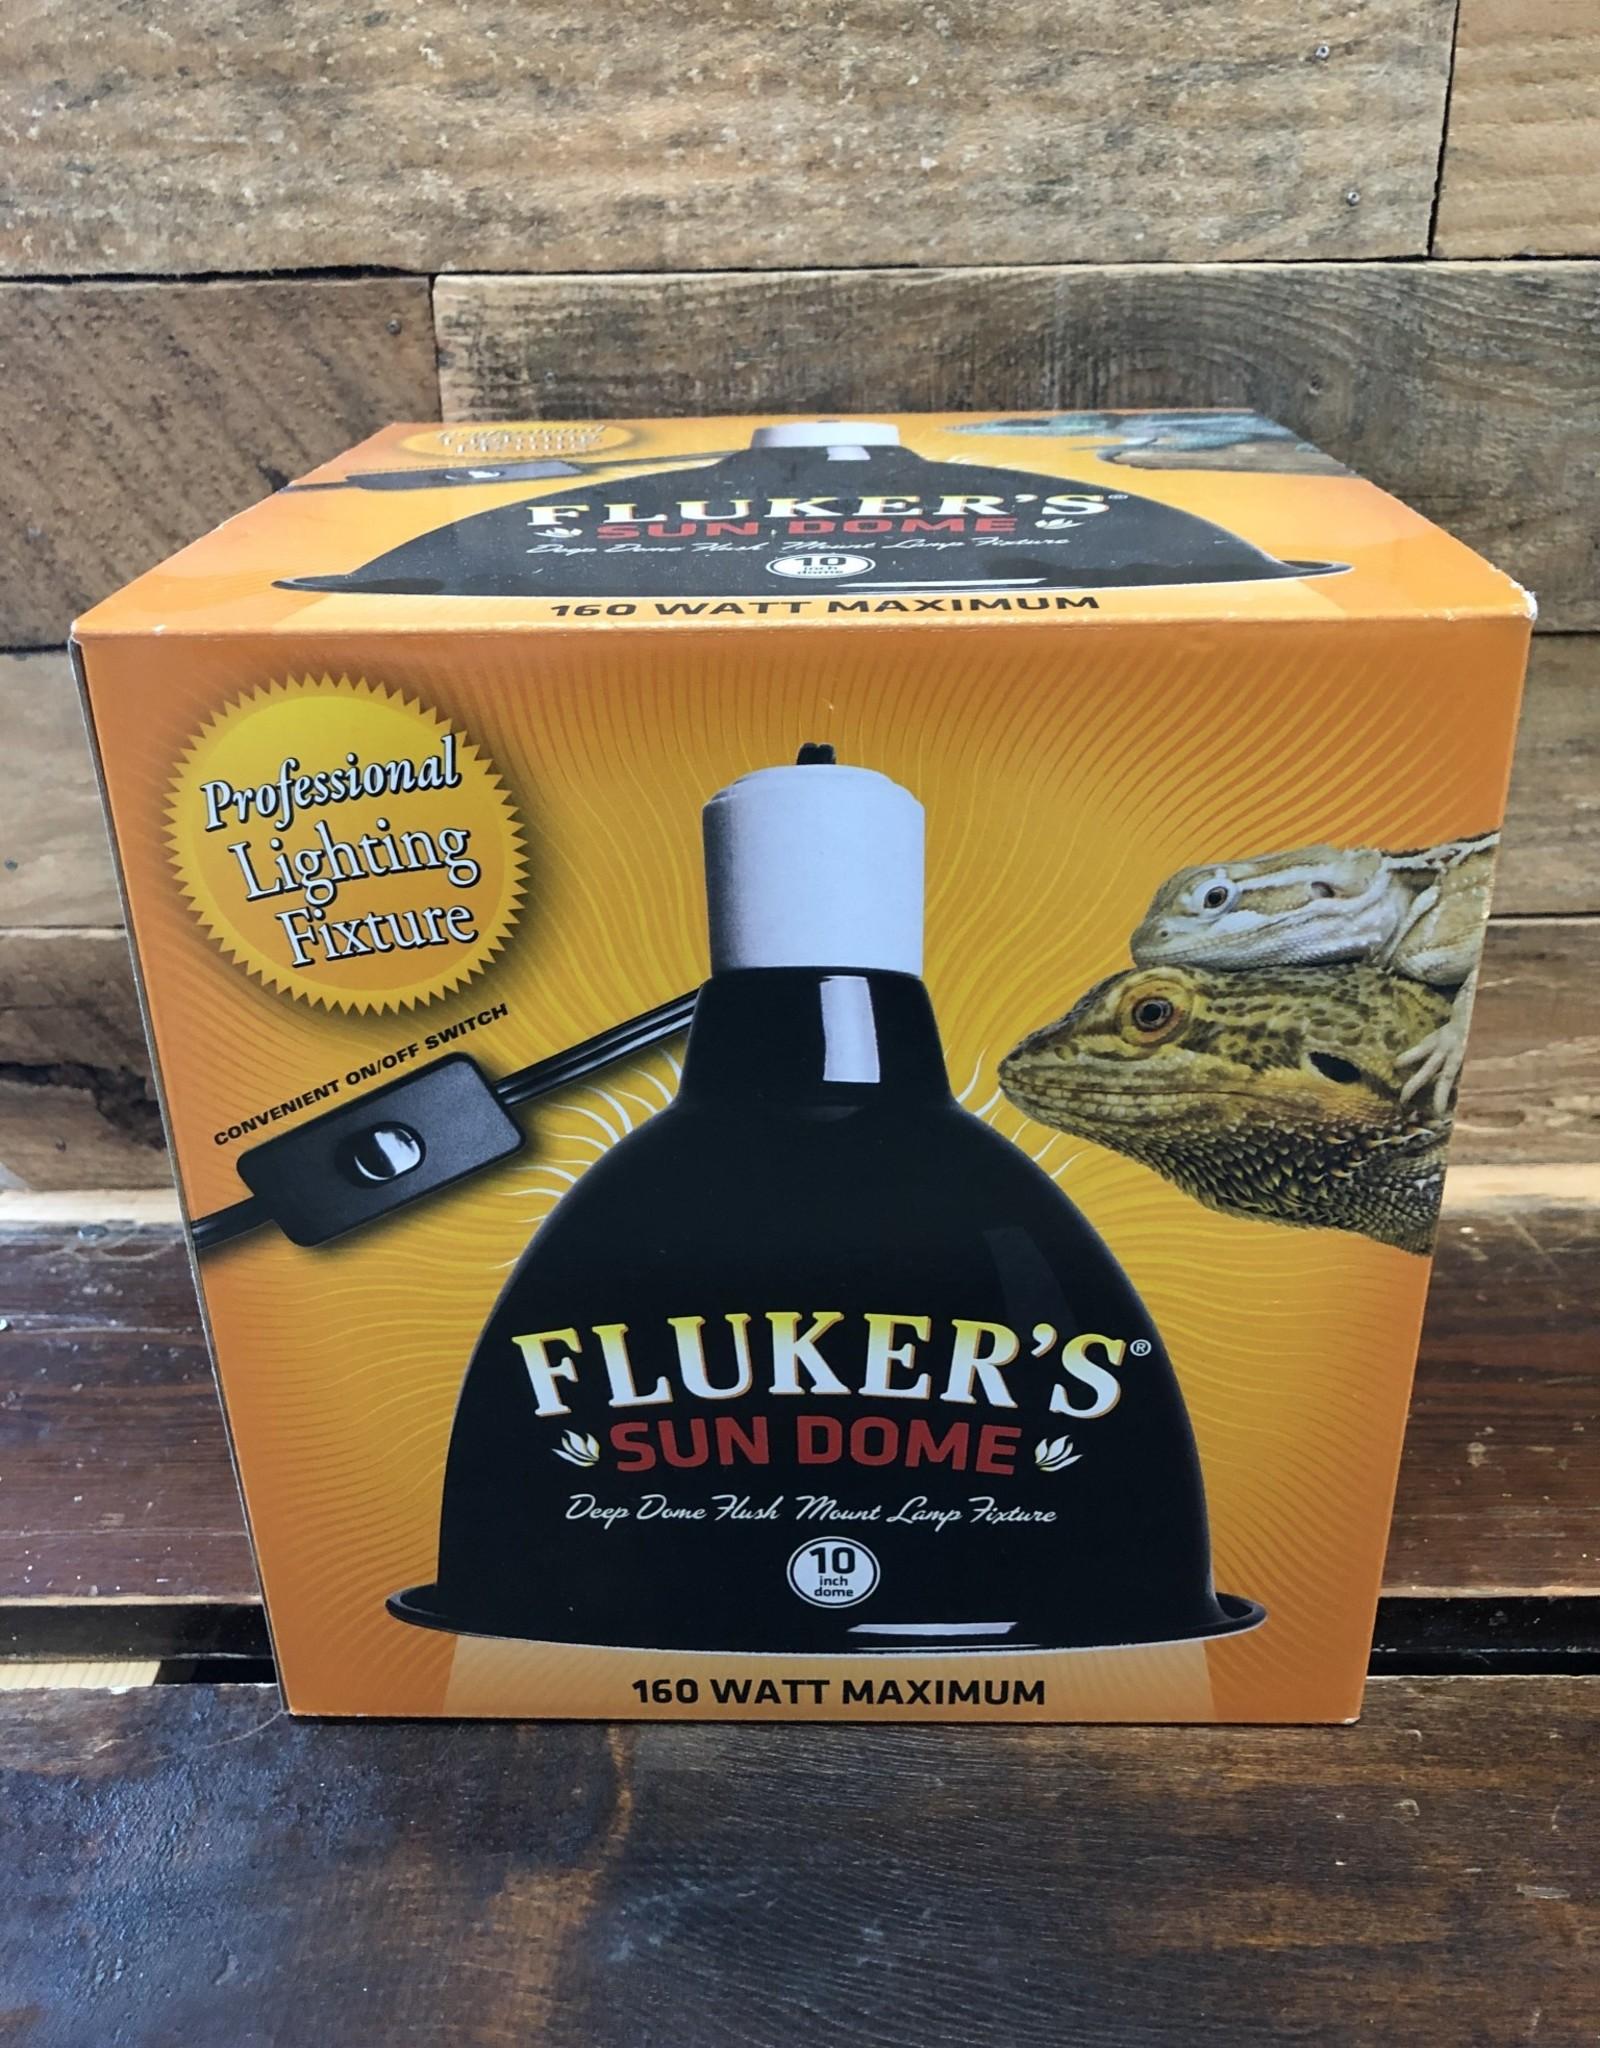 FLUKER FARMS 10 IN. DEEP DOME LAMP FIXTURE